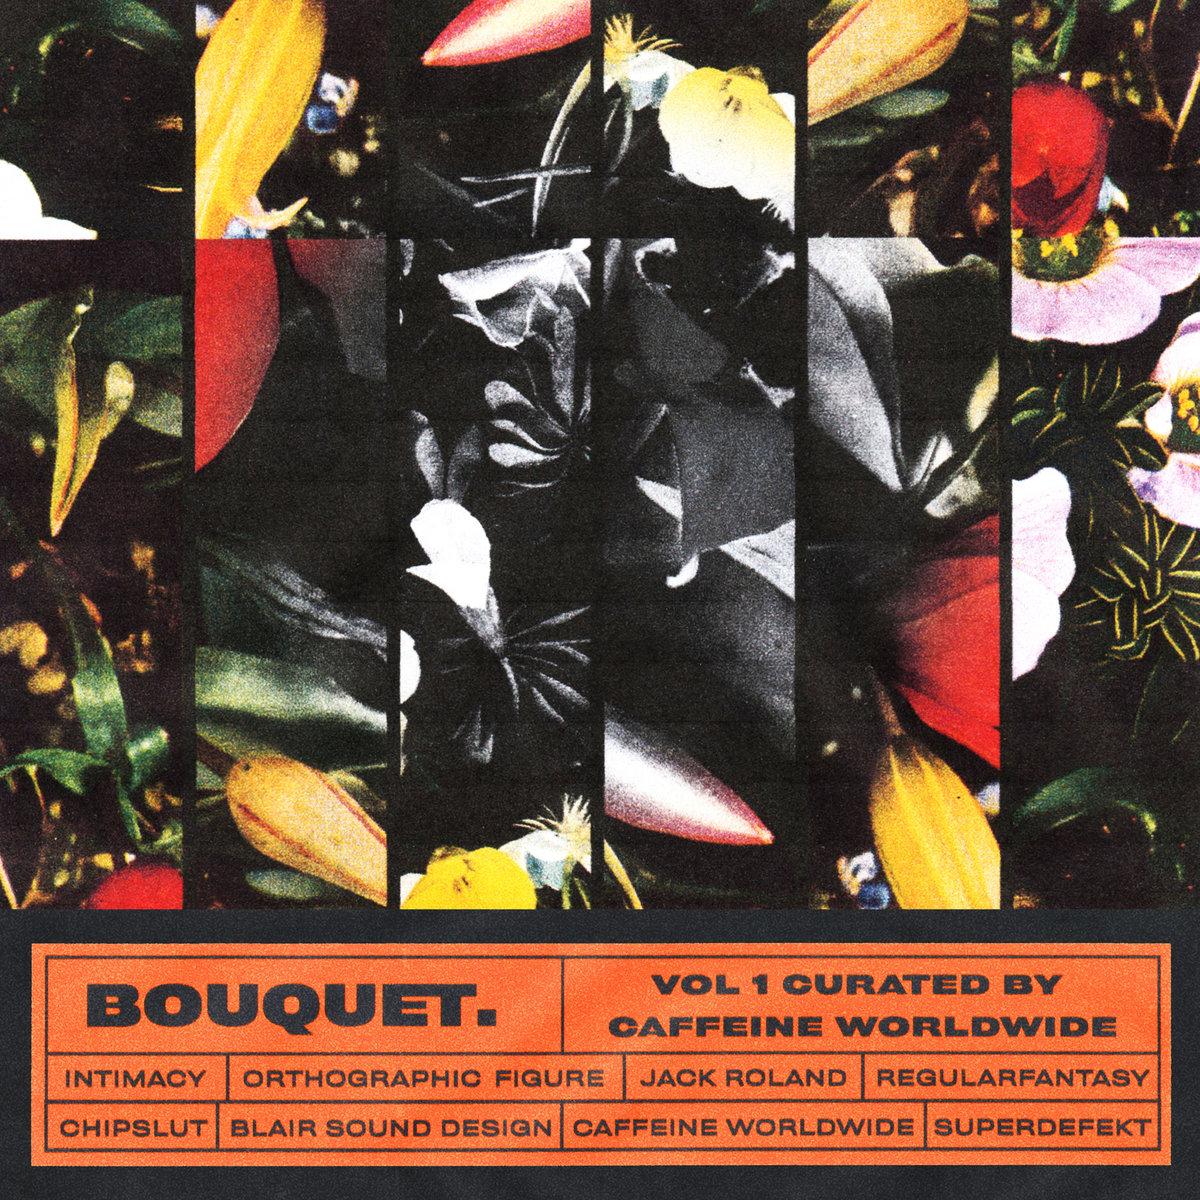 Excellent Compilation with Superdefekt's Kajüte track among other brillant tunes